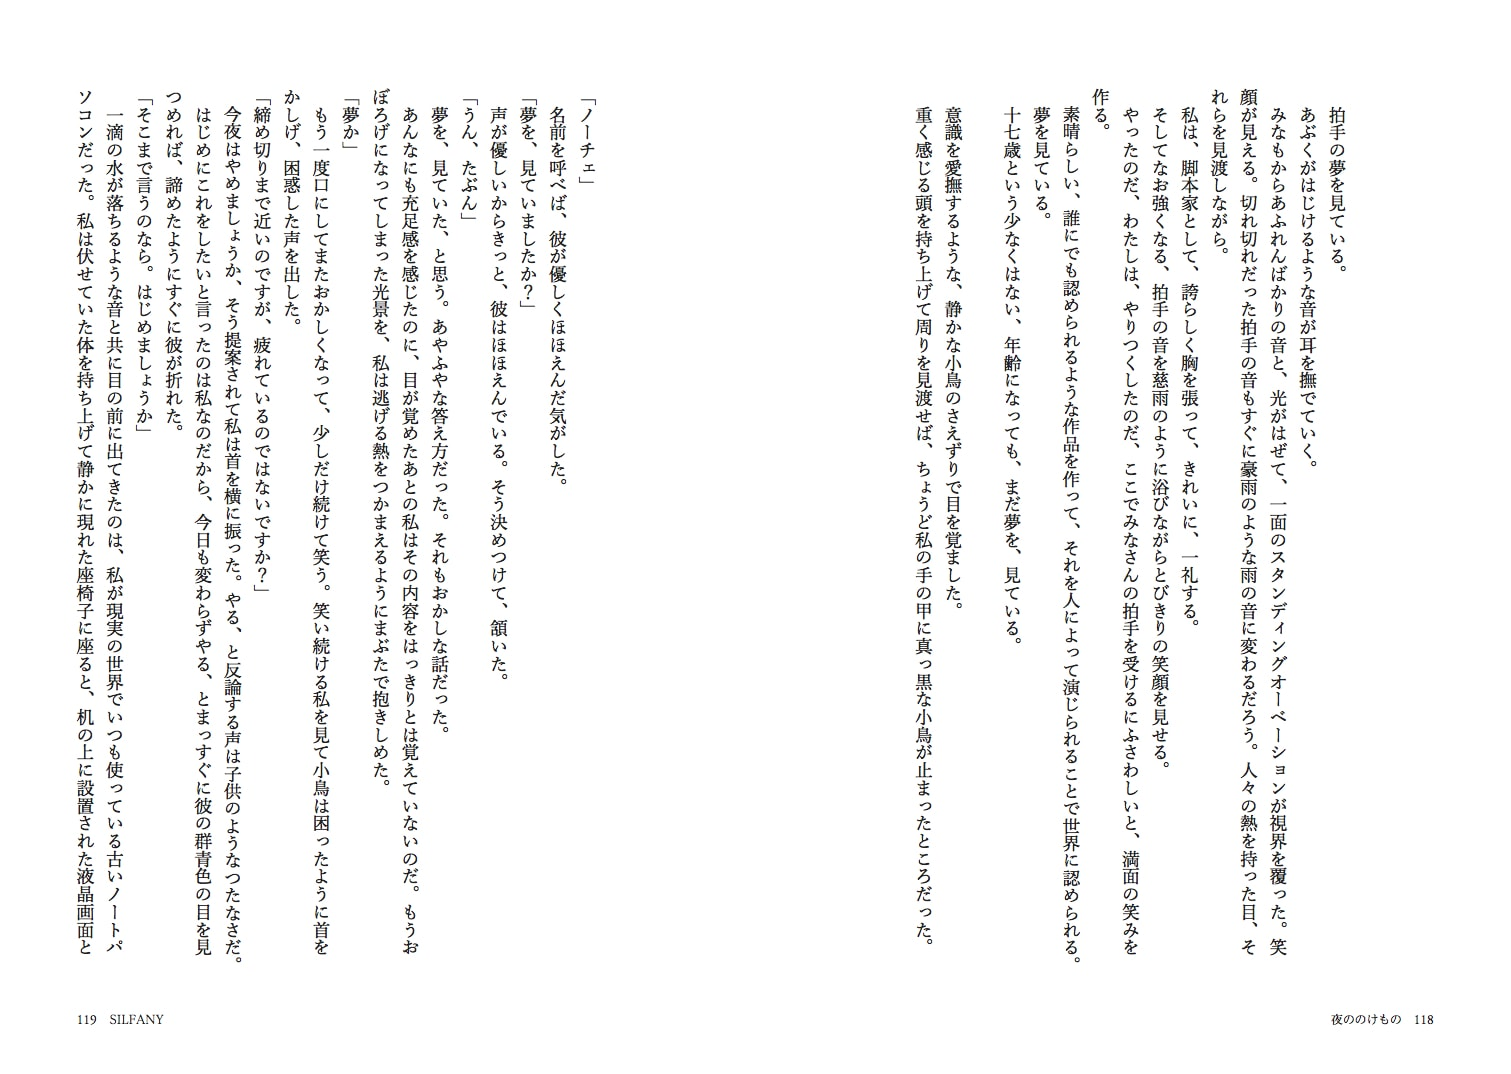 SILFANY vol.2